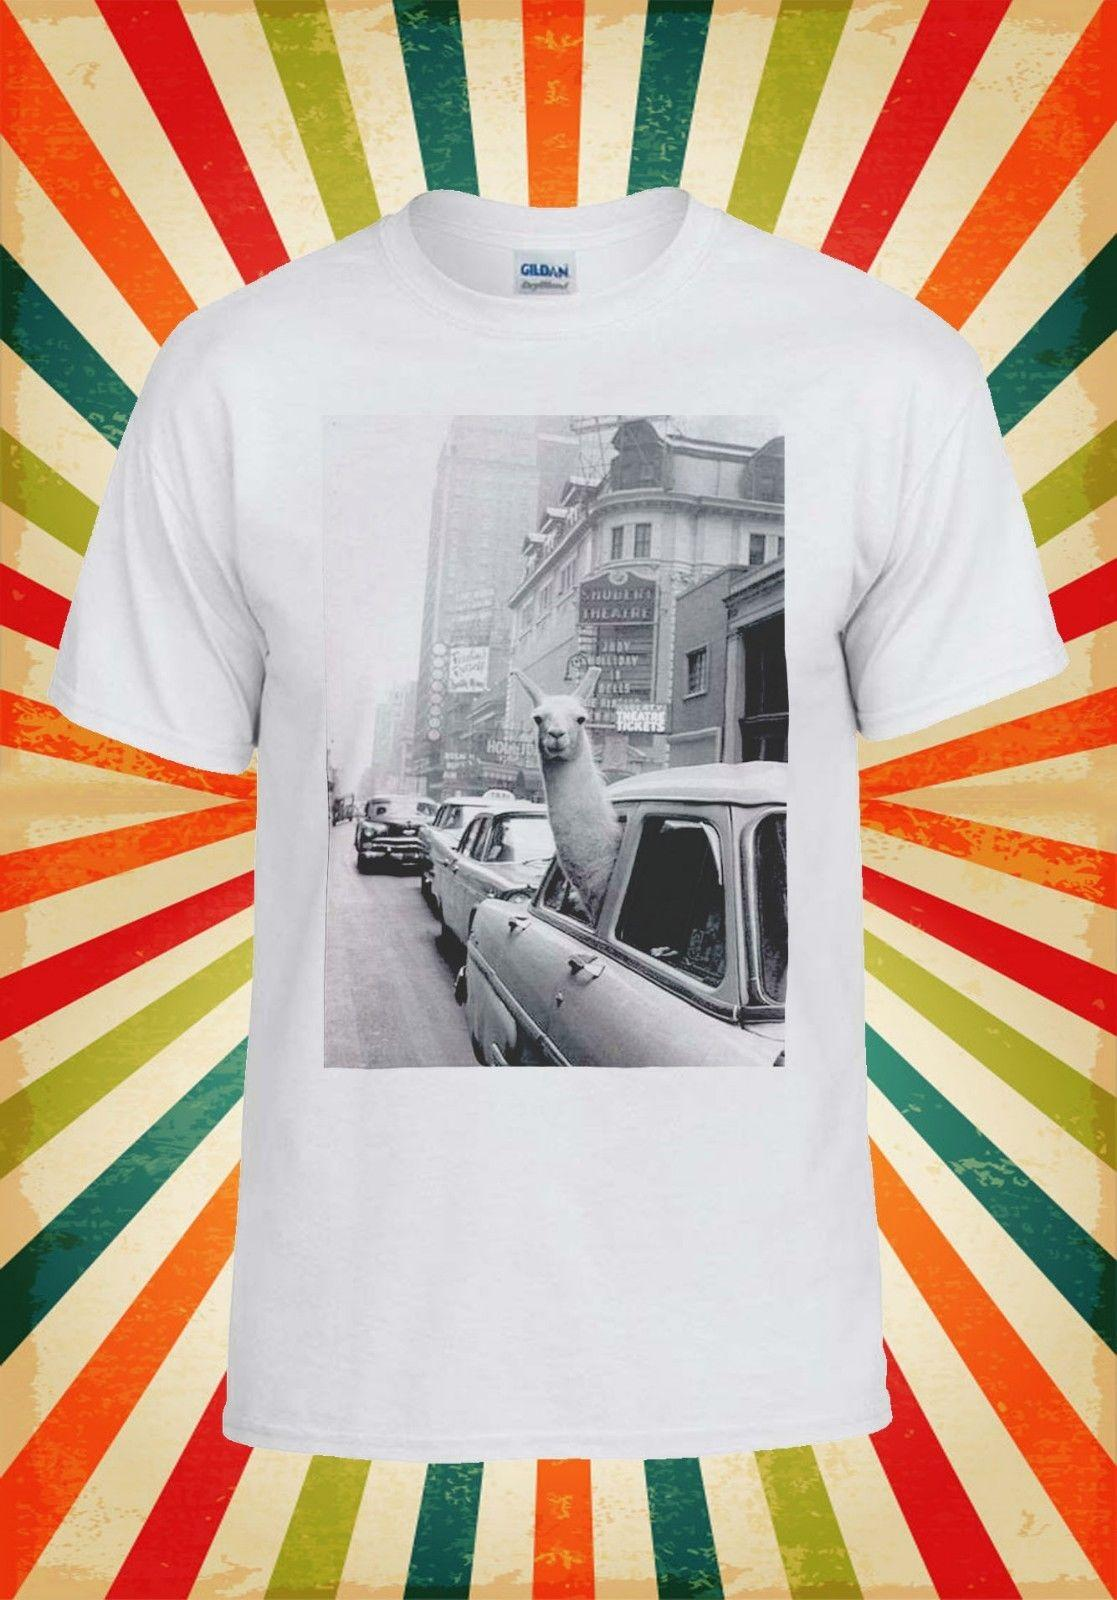 Llama Lama Car Vintage Cool Funny Men Women Vest Tank Top Unisex T Shirt  608 Online with  13.66 Piece on Cheaptshirts48 s Store  14cd1d9a3